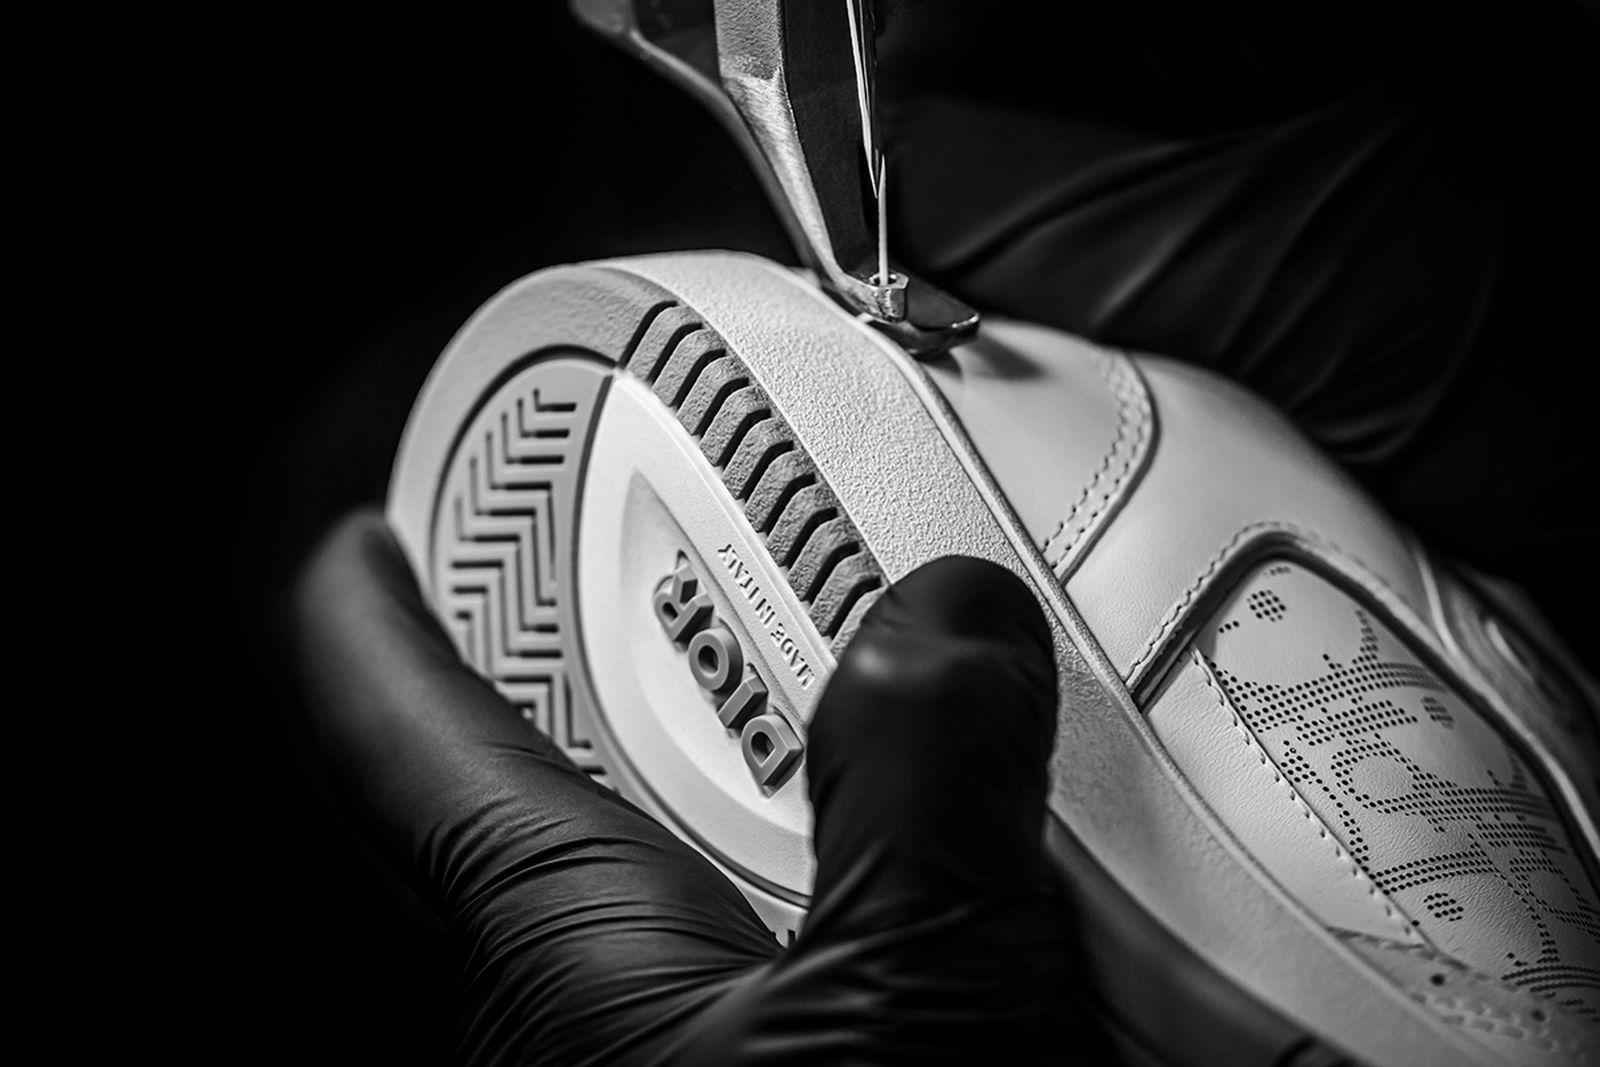 dior-b27-sneaker-release-date-price-new-02